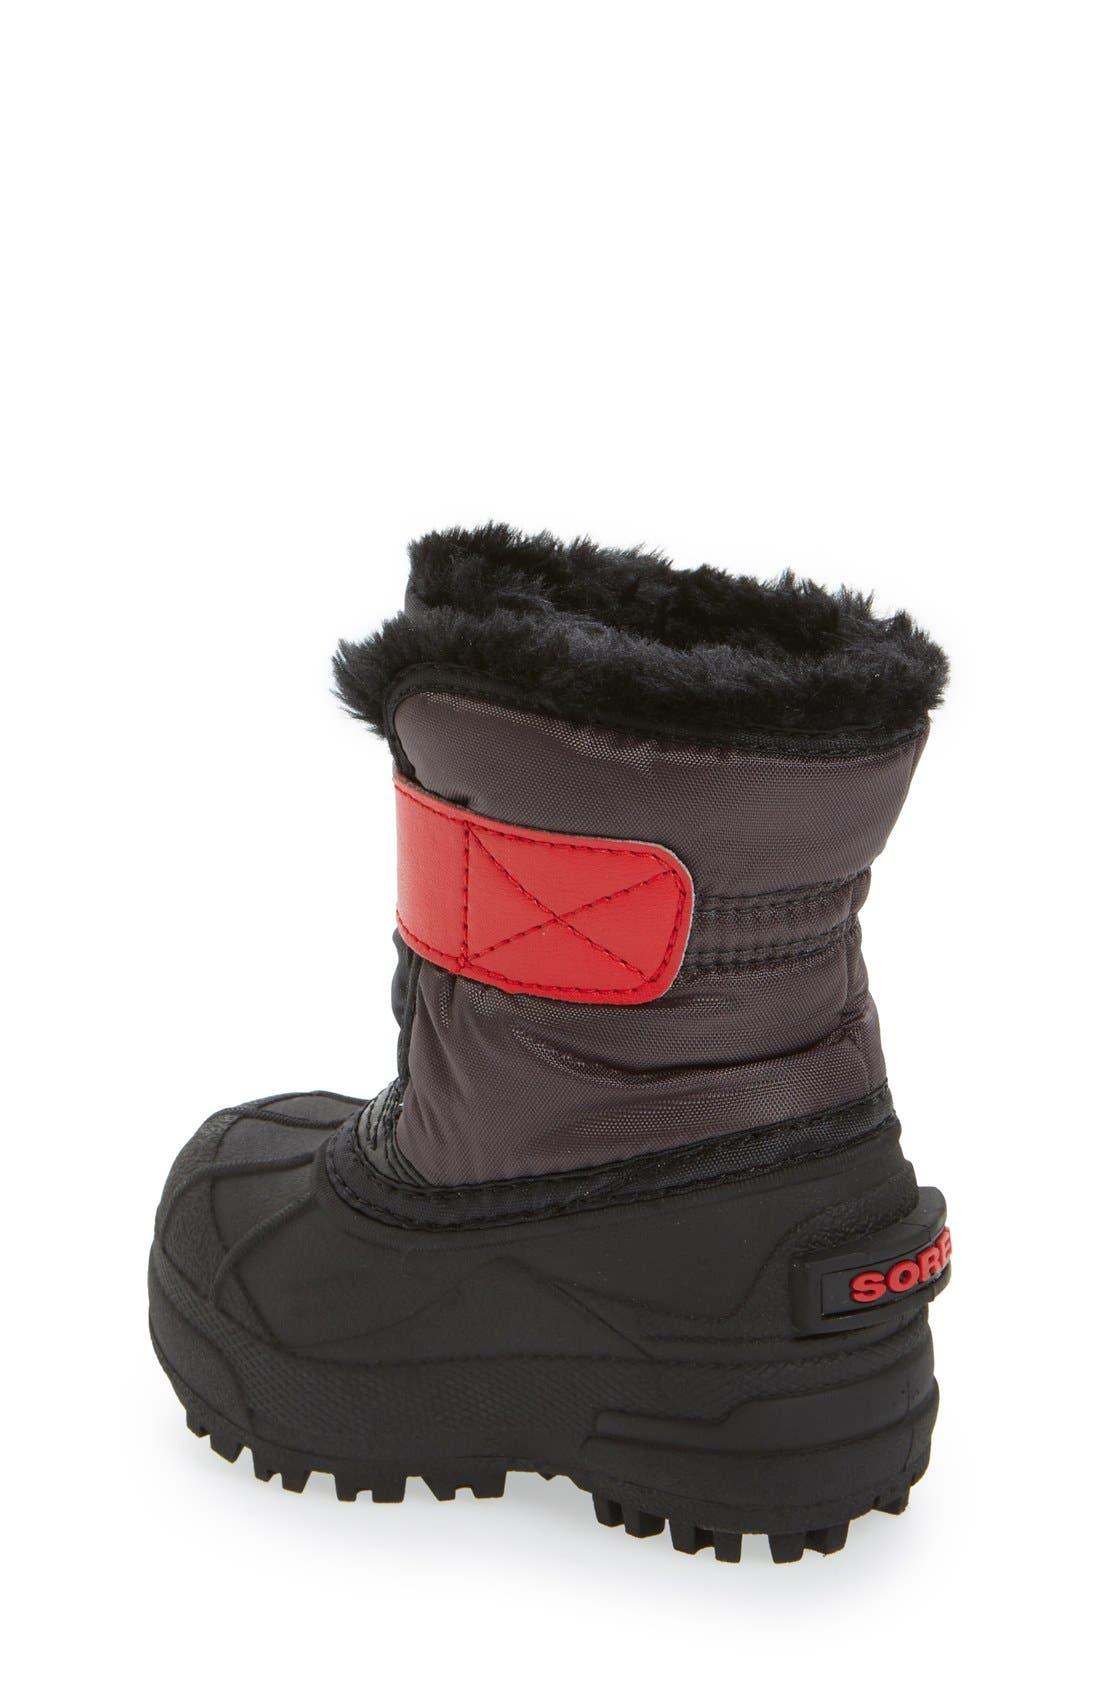 Alternate Image 2  - SOREL 'Snow Commander' Boot (Baby, Walker, Toddler & Little Kid)